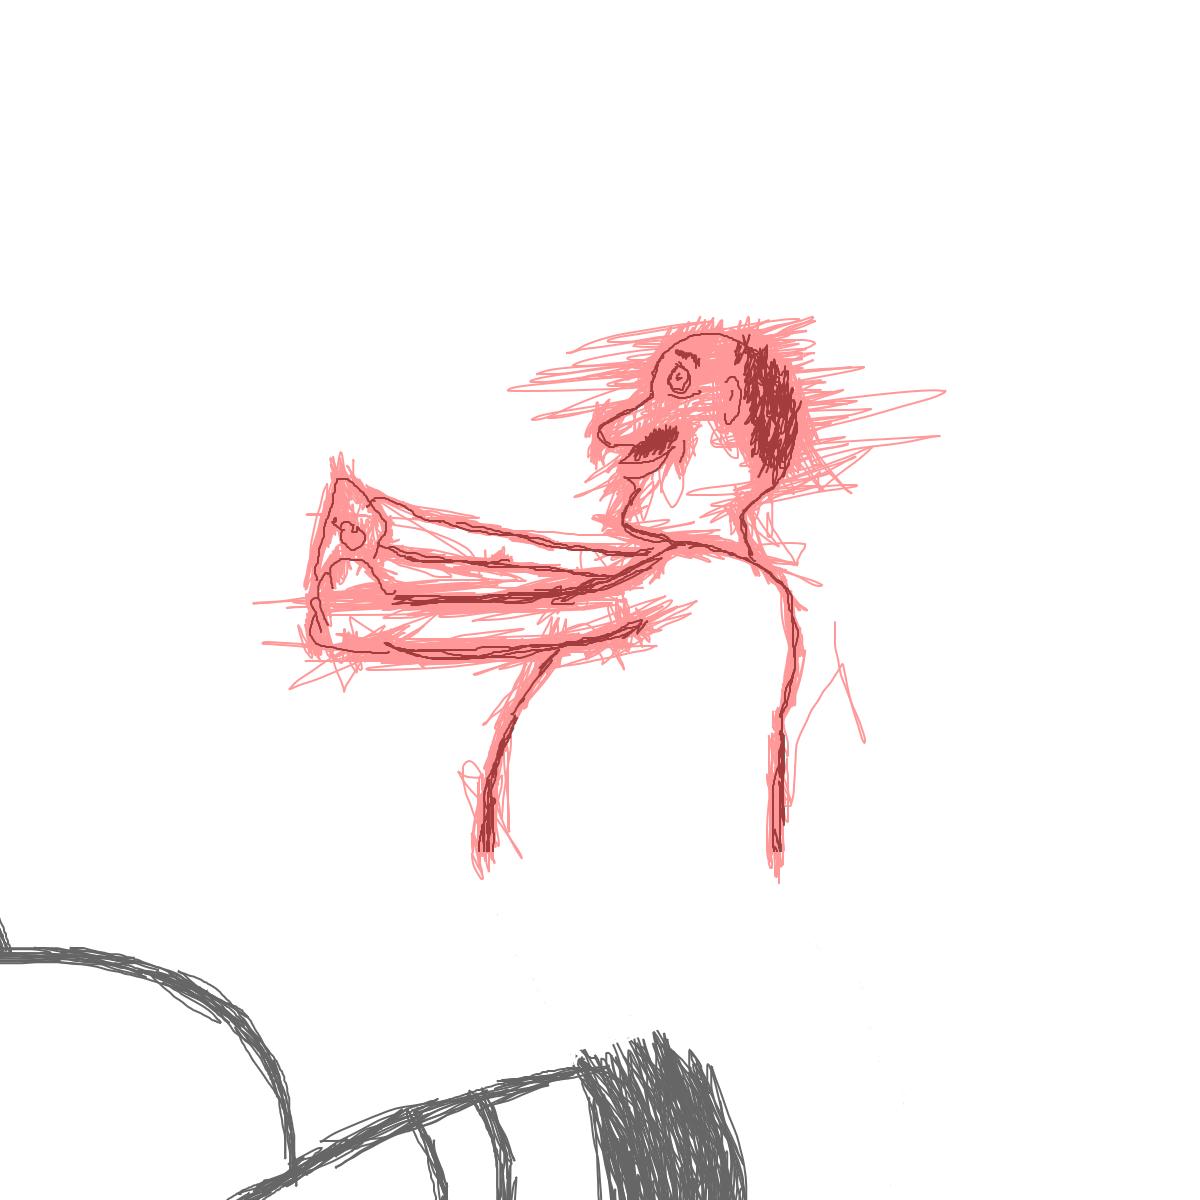 BAAAM drawing#4583 lat:44.3511886596679700lng: -4.6806507110595700